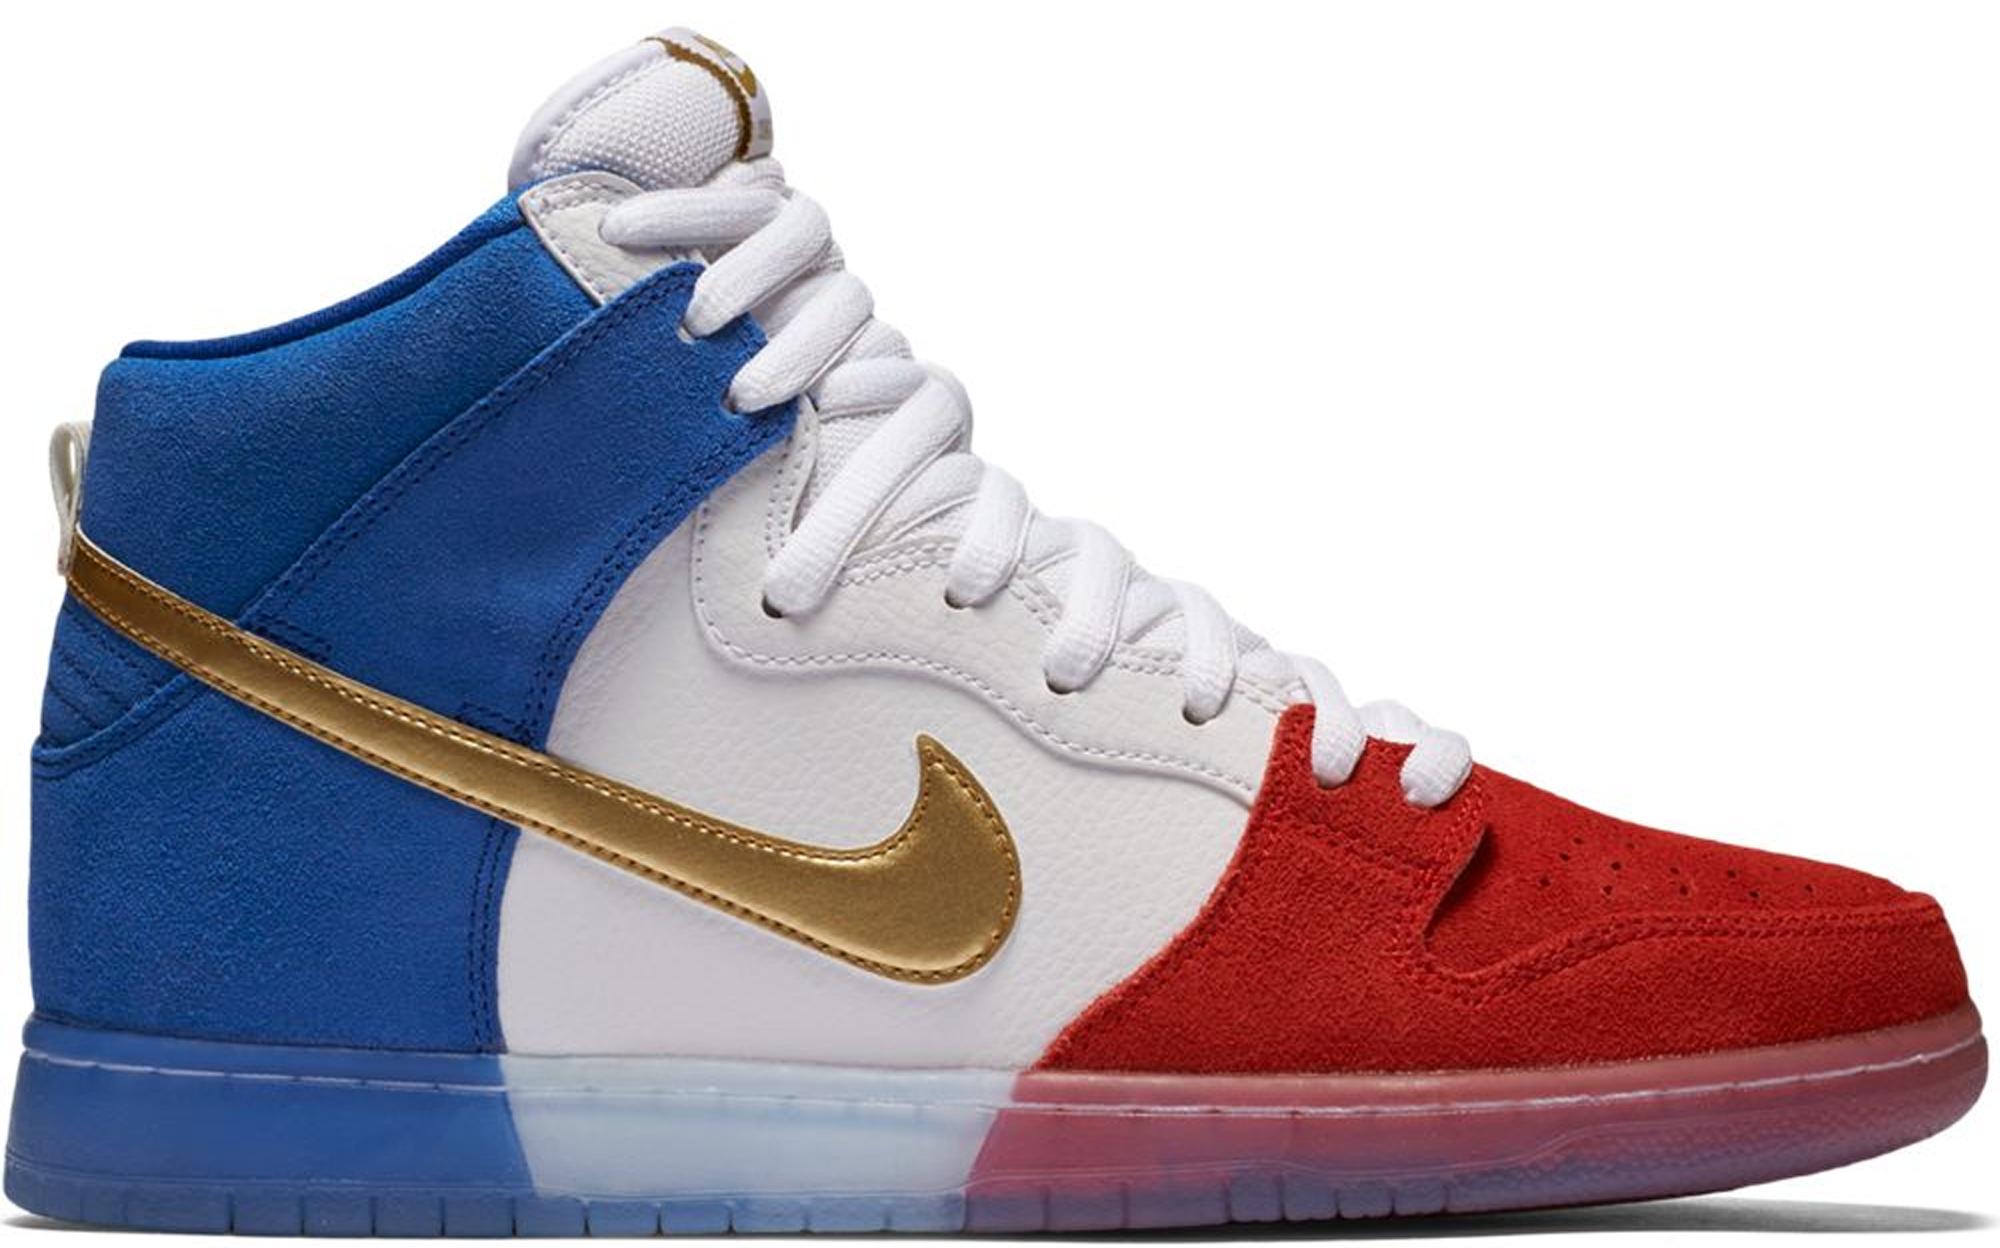 Nike SB Dunk High Tricolor (USA)